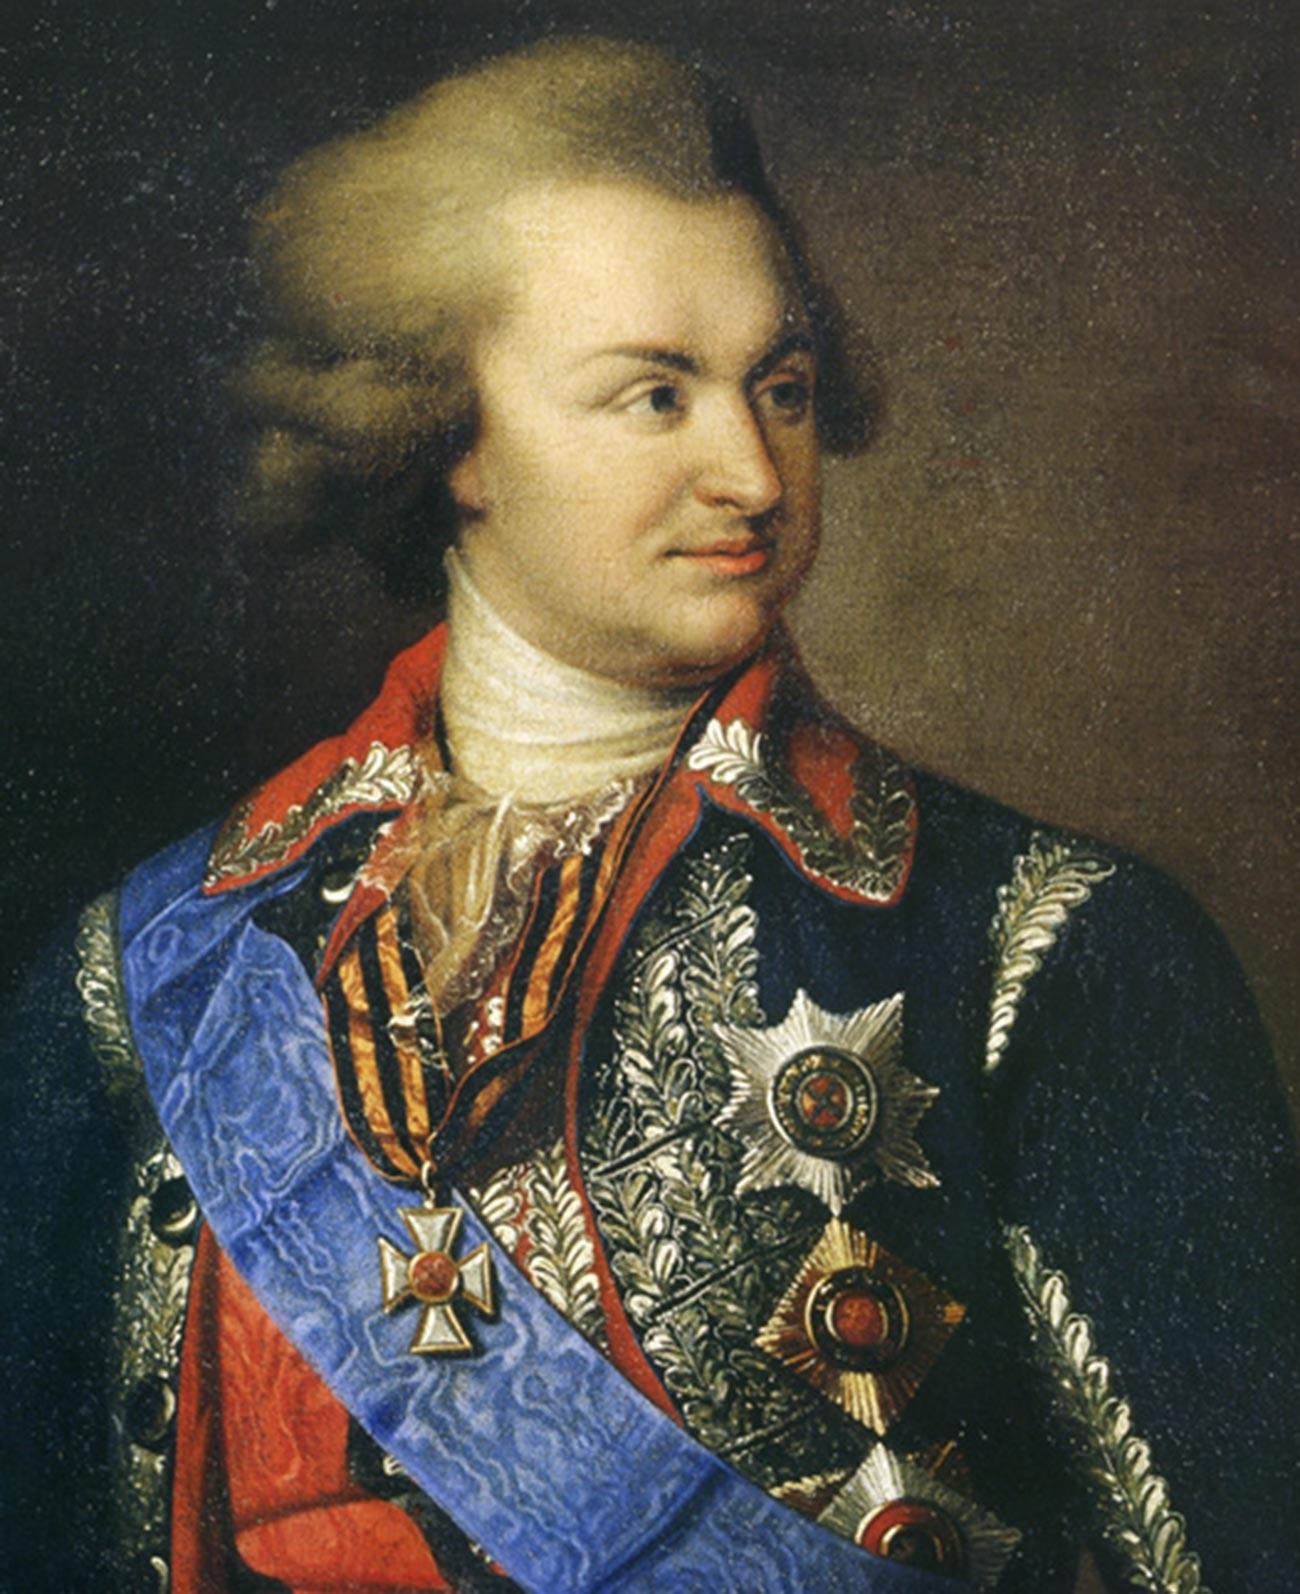 Grigorij Aleksandrovič Potemkin-Tavričeski